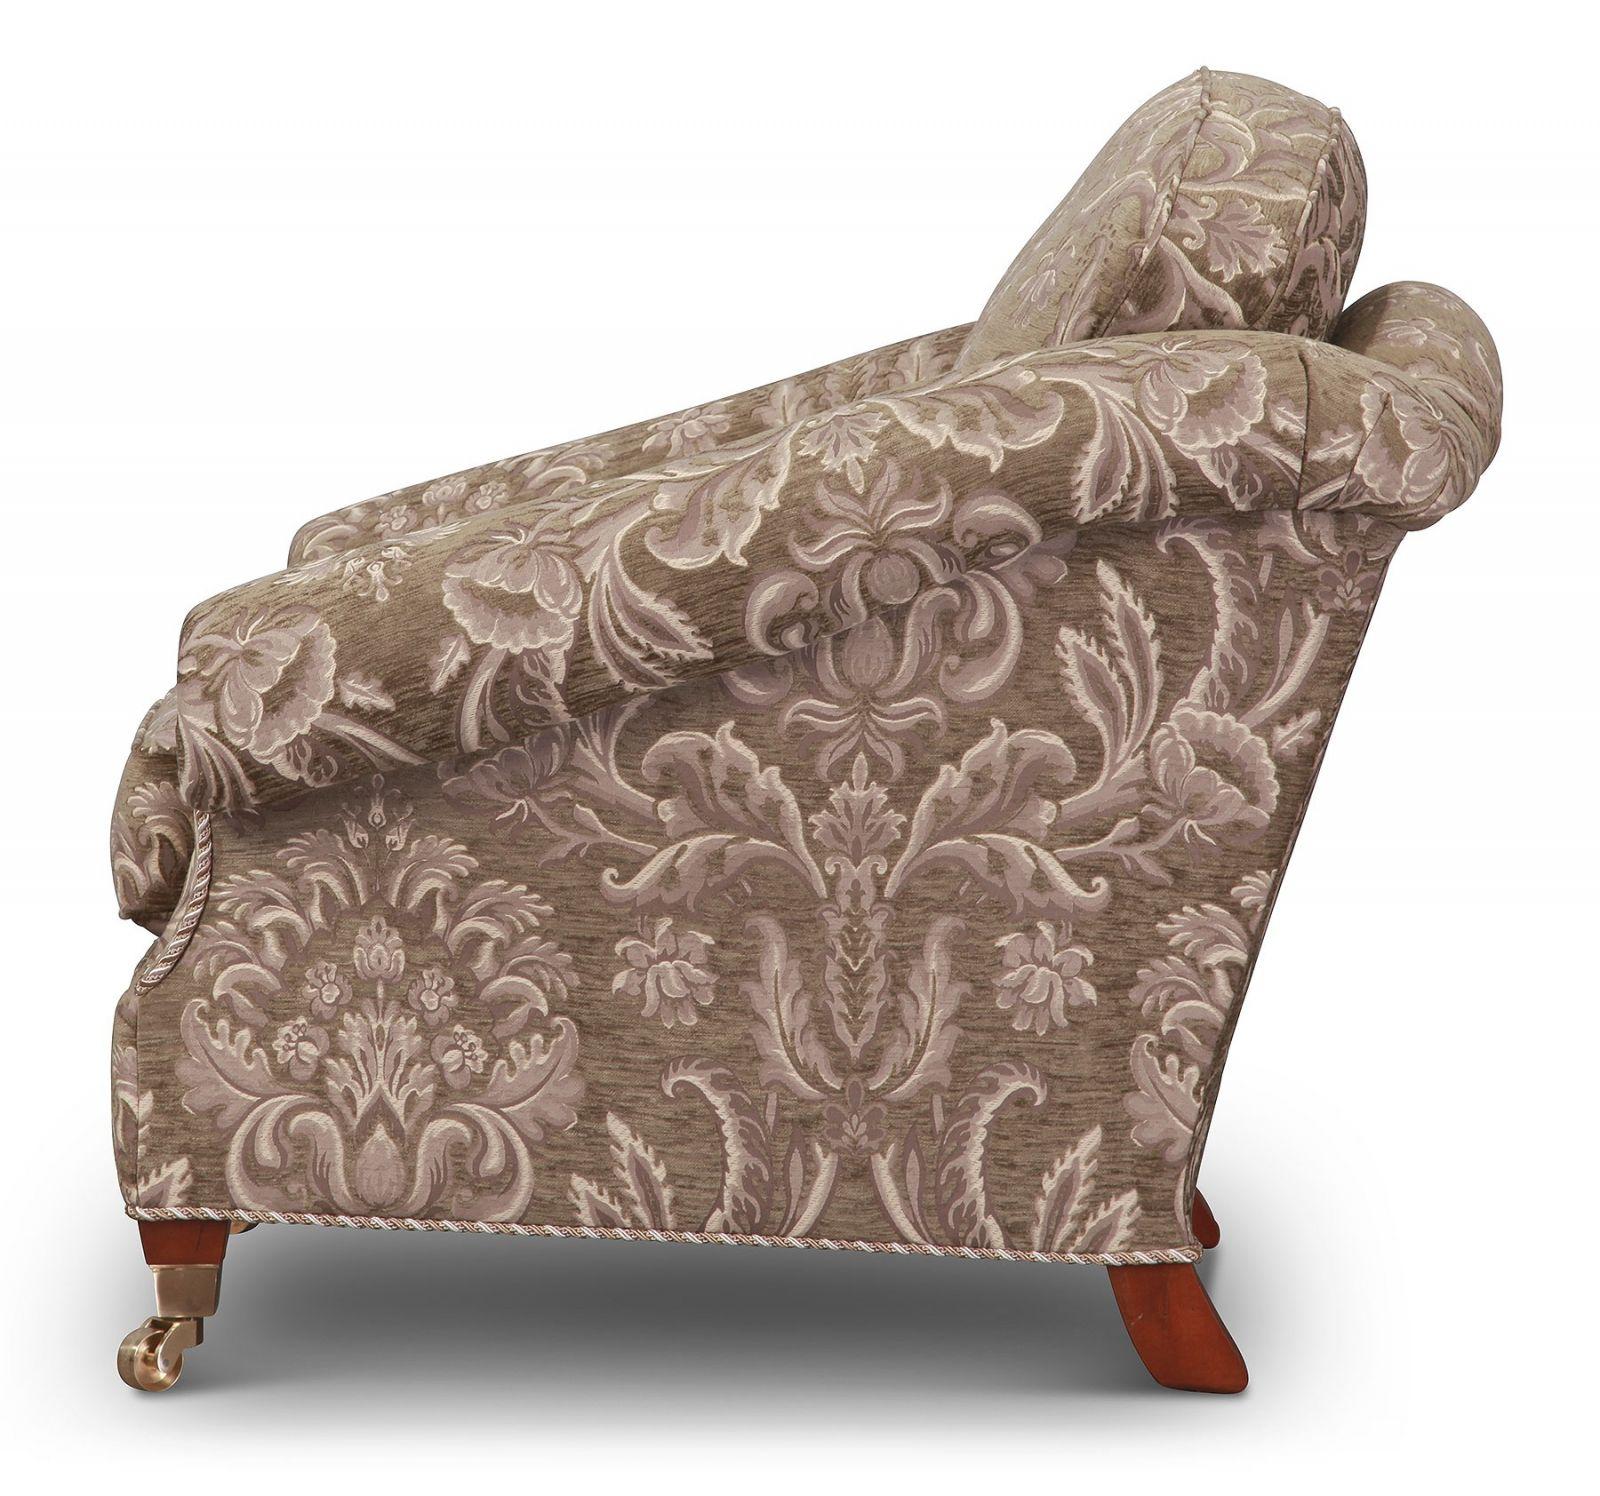 Renoir chair in grey-green chenille